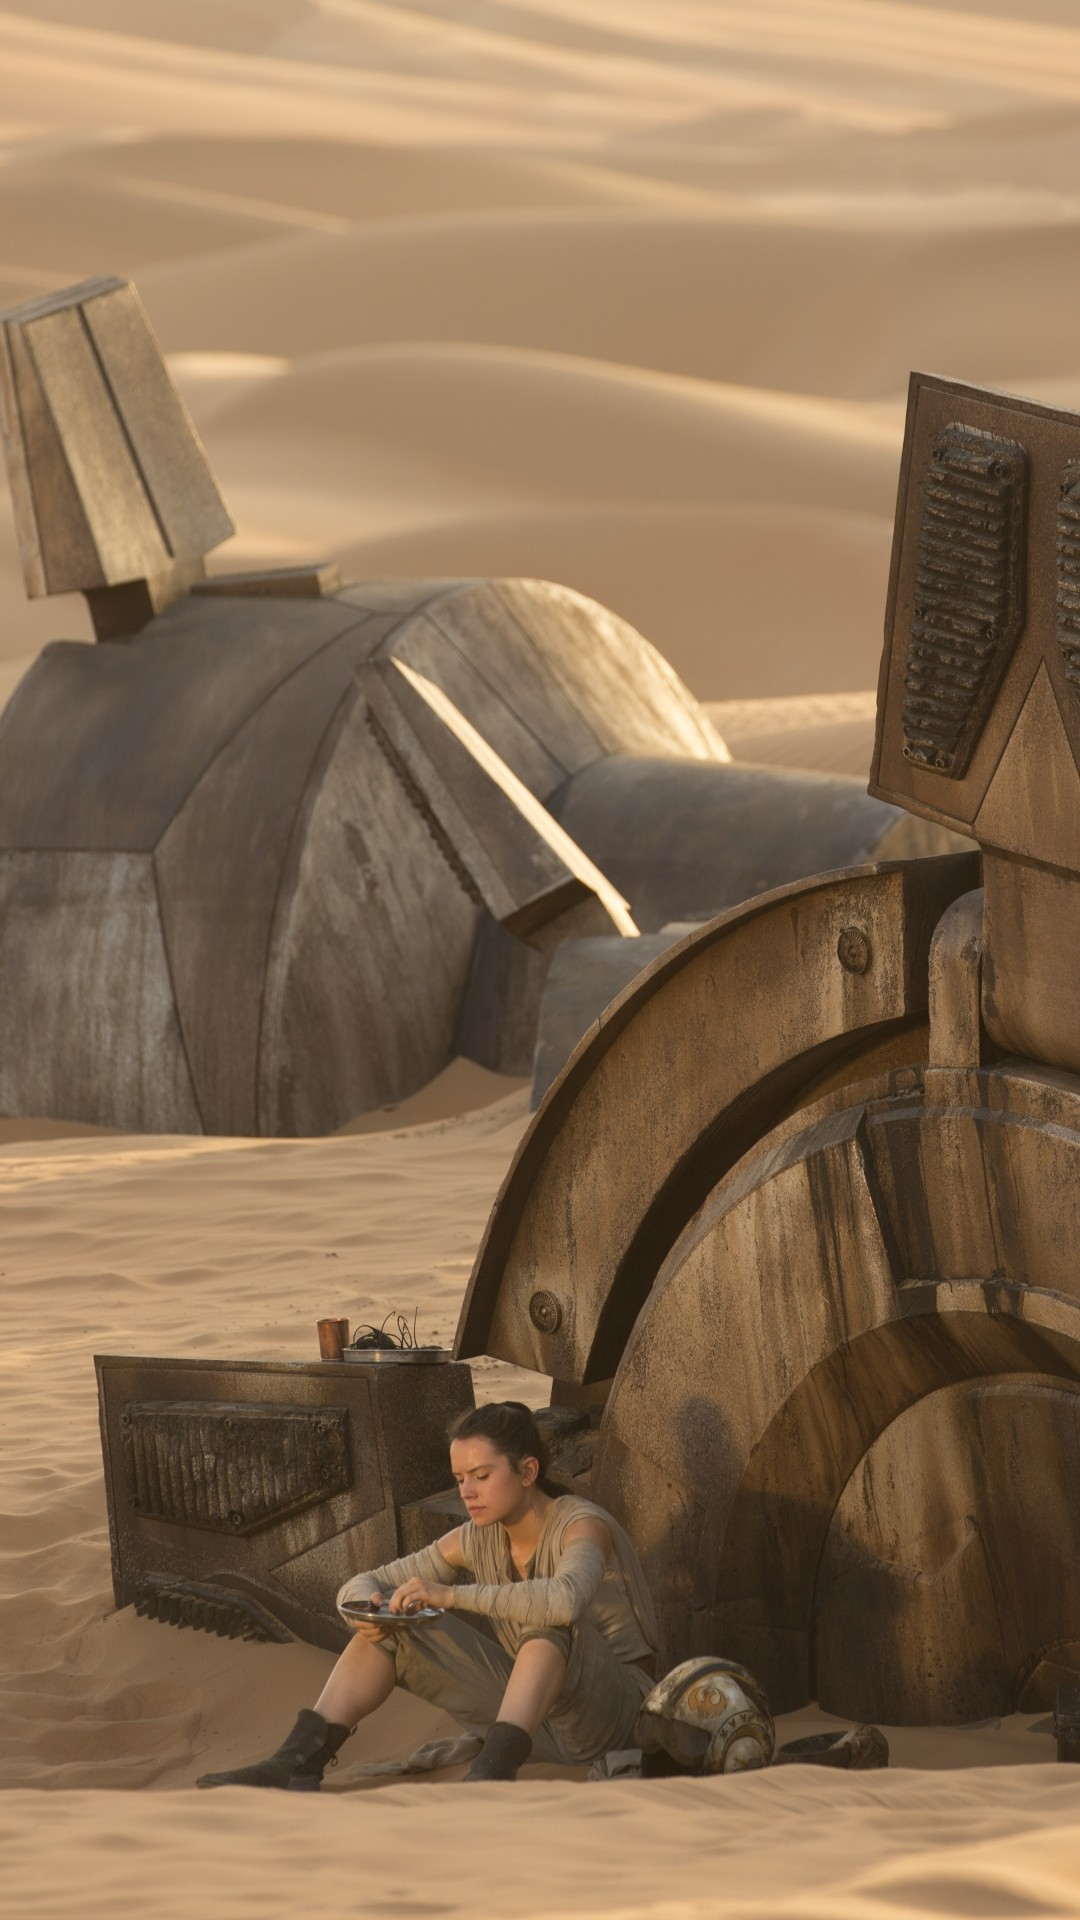 Rey Star Wars Wallpaper Download Cool Wallpapers Rey Star Wars Wallpaper Iphone 2926740 Hd Wallpaper Backgrounds Download